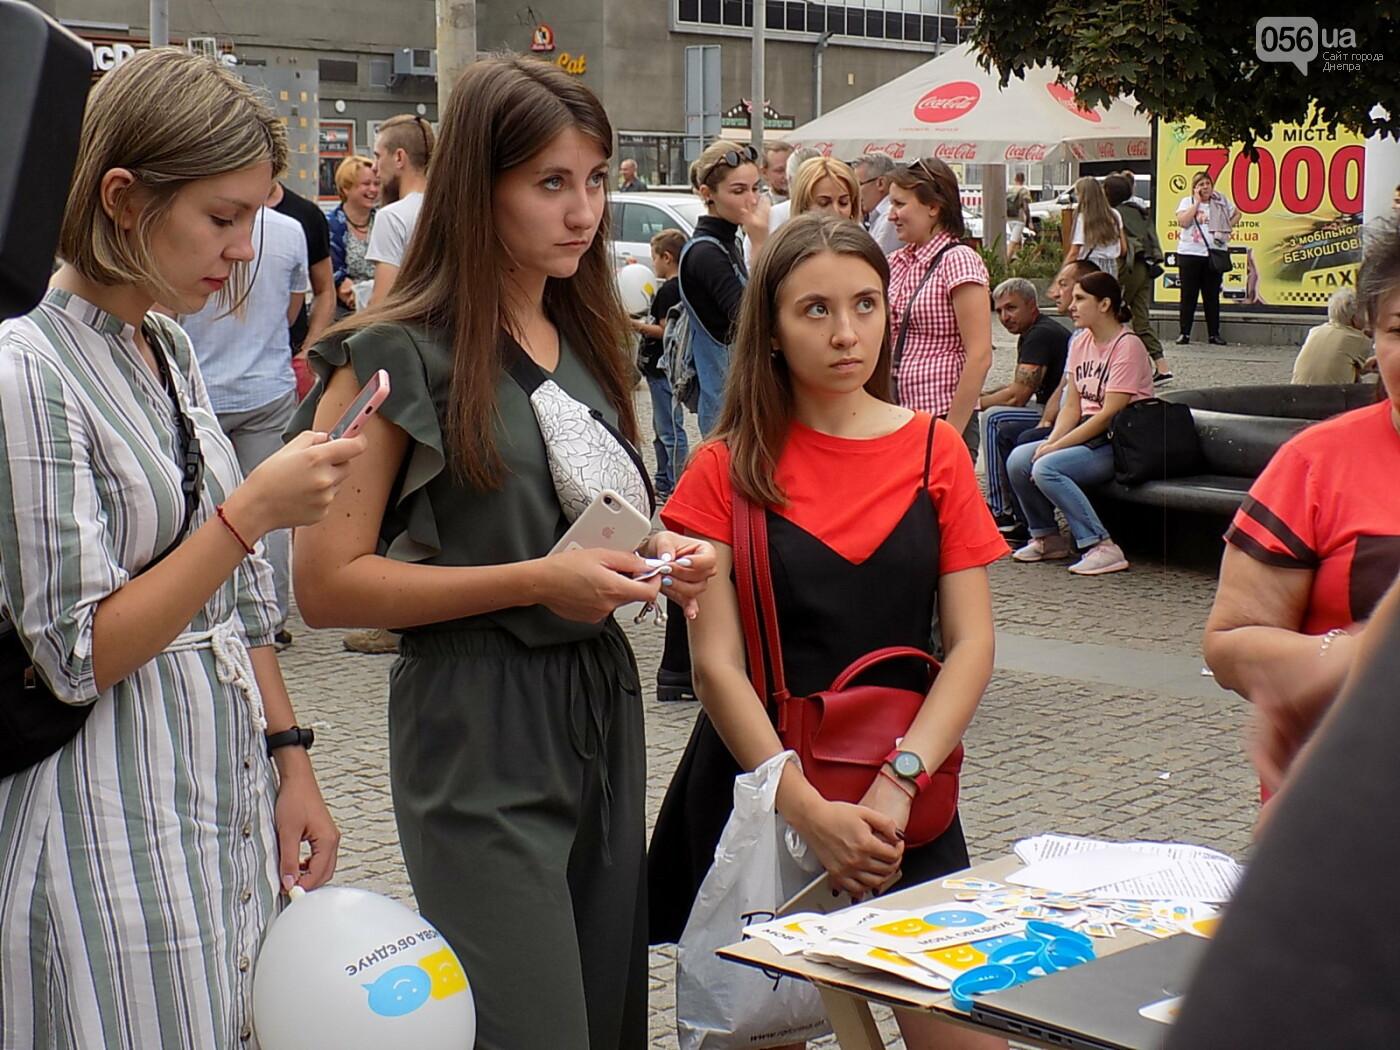 """Мова єднає Дніпро"": в центре города прошла символическая акция с концертом и подарками, - ФОТО, фото-6"